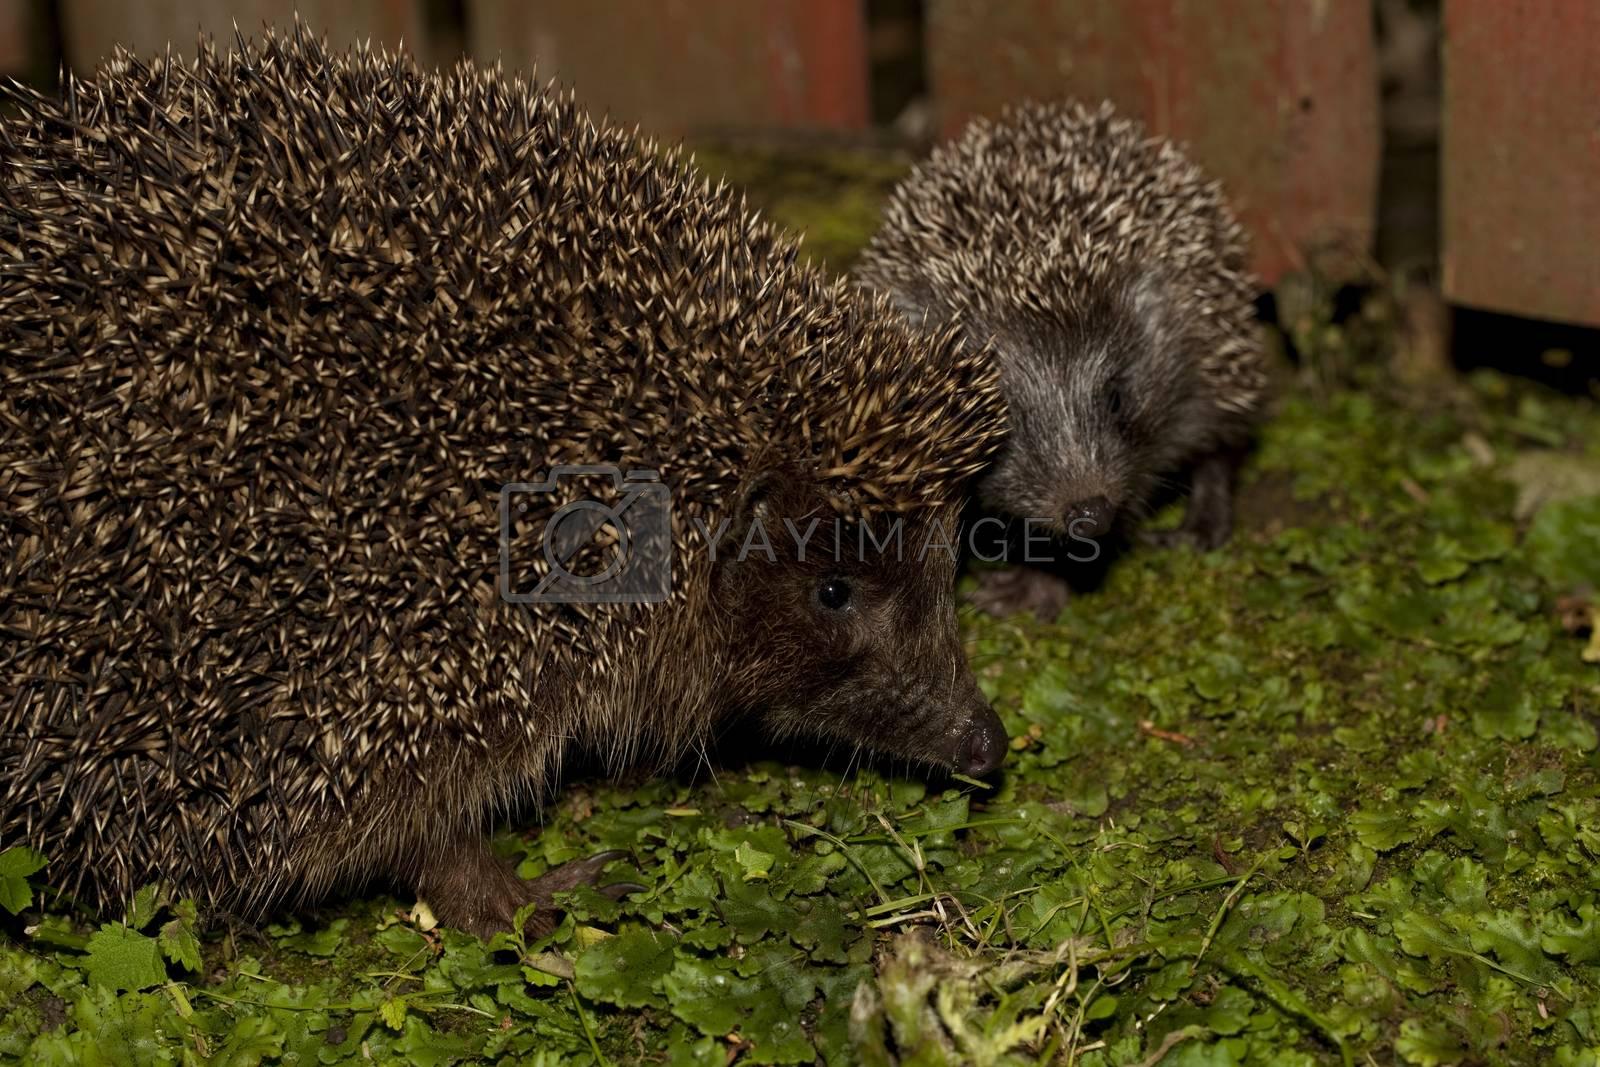 hedgehog by dabjola